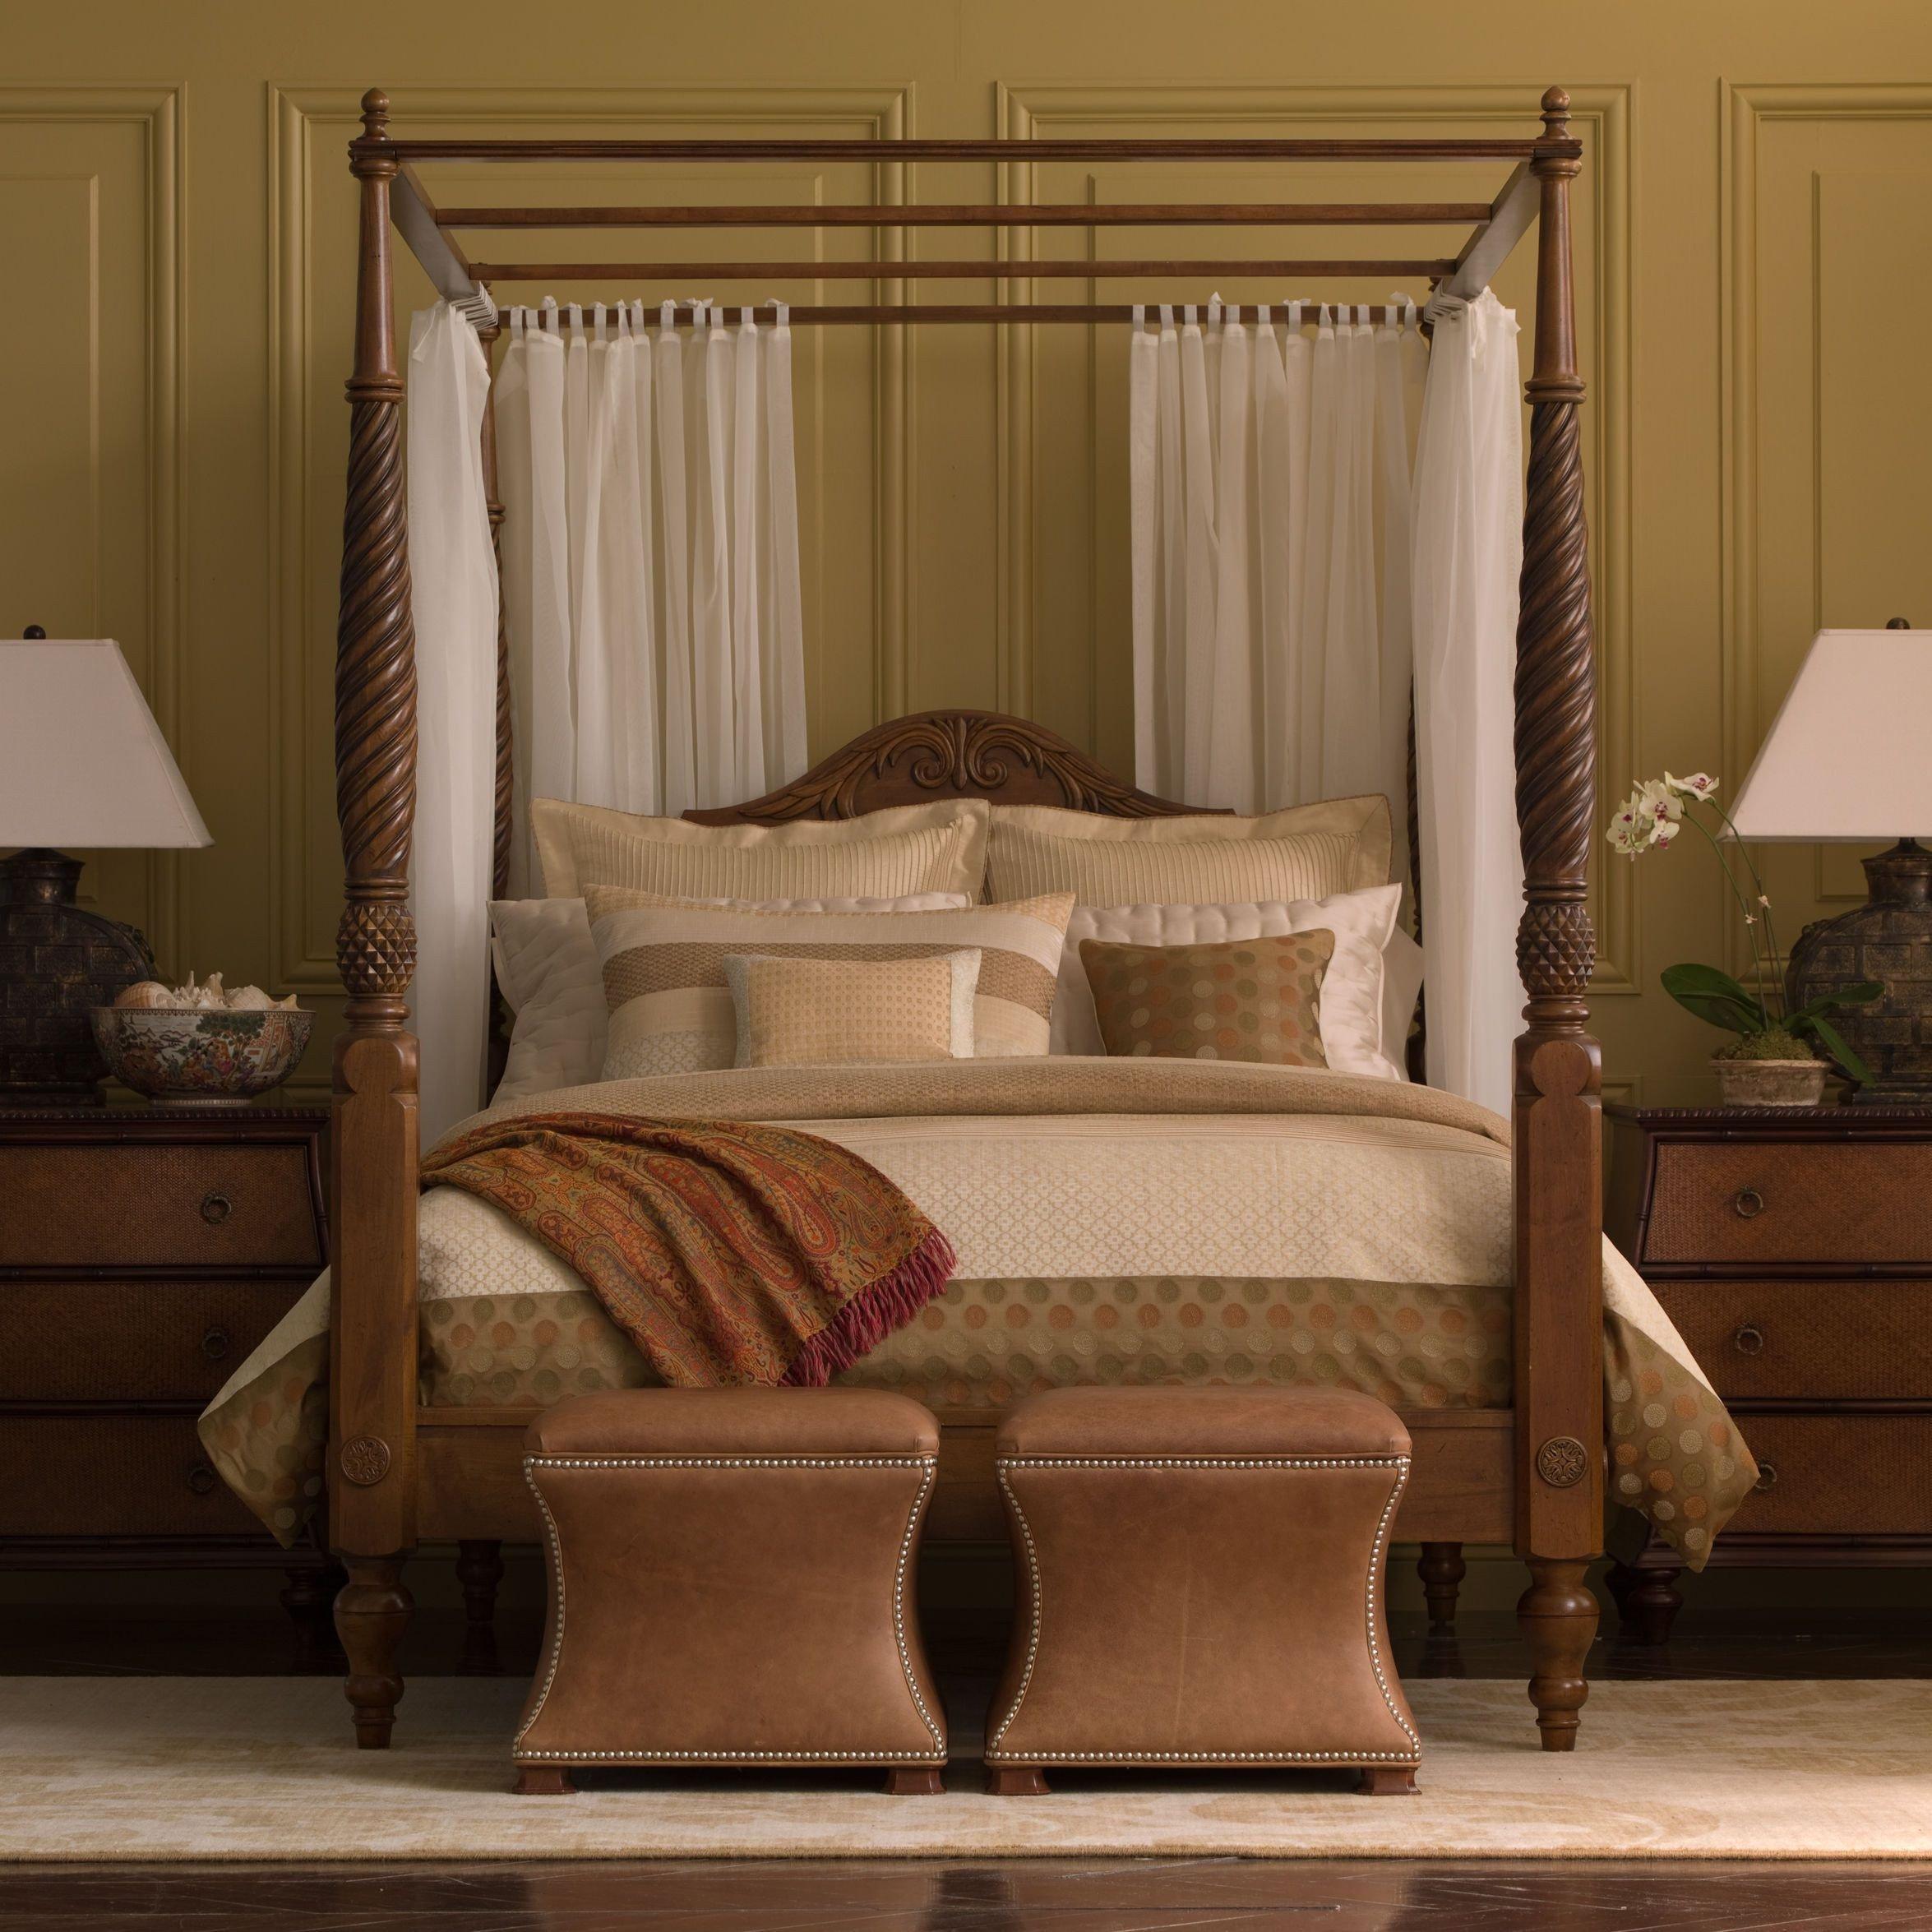 California King Canopy Bedroom Set Elegant Montego Canopy Bed Ethan Allen Us